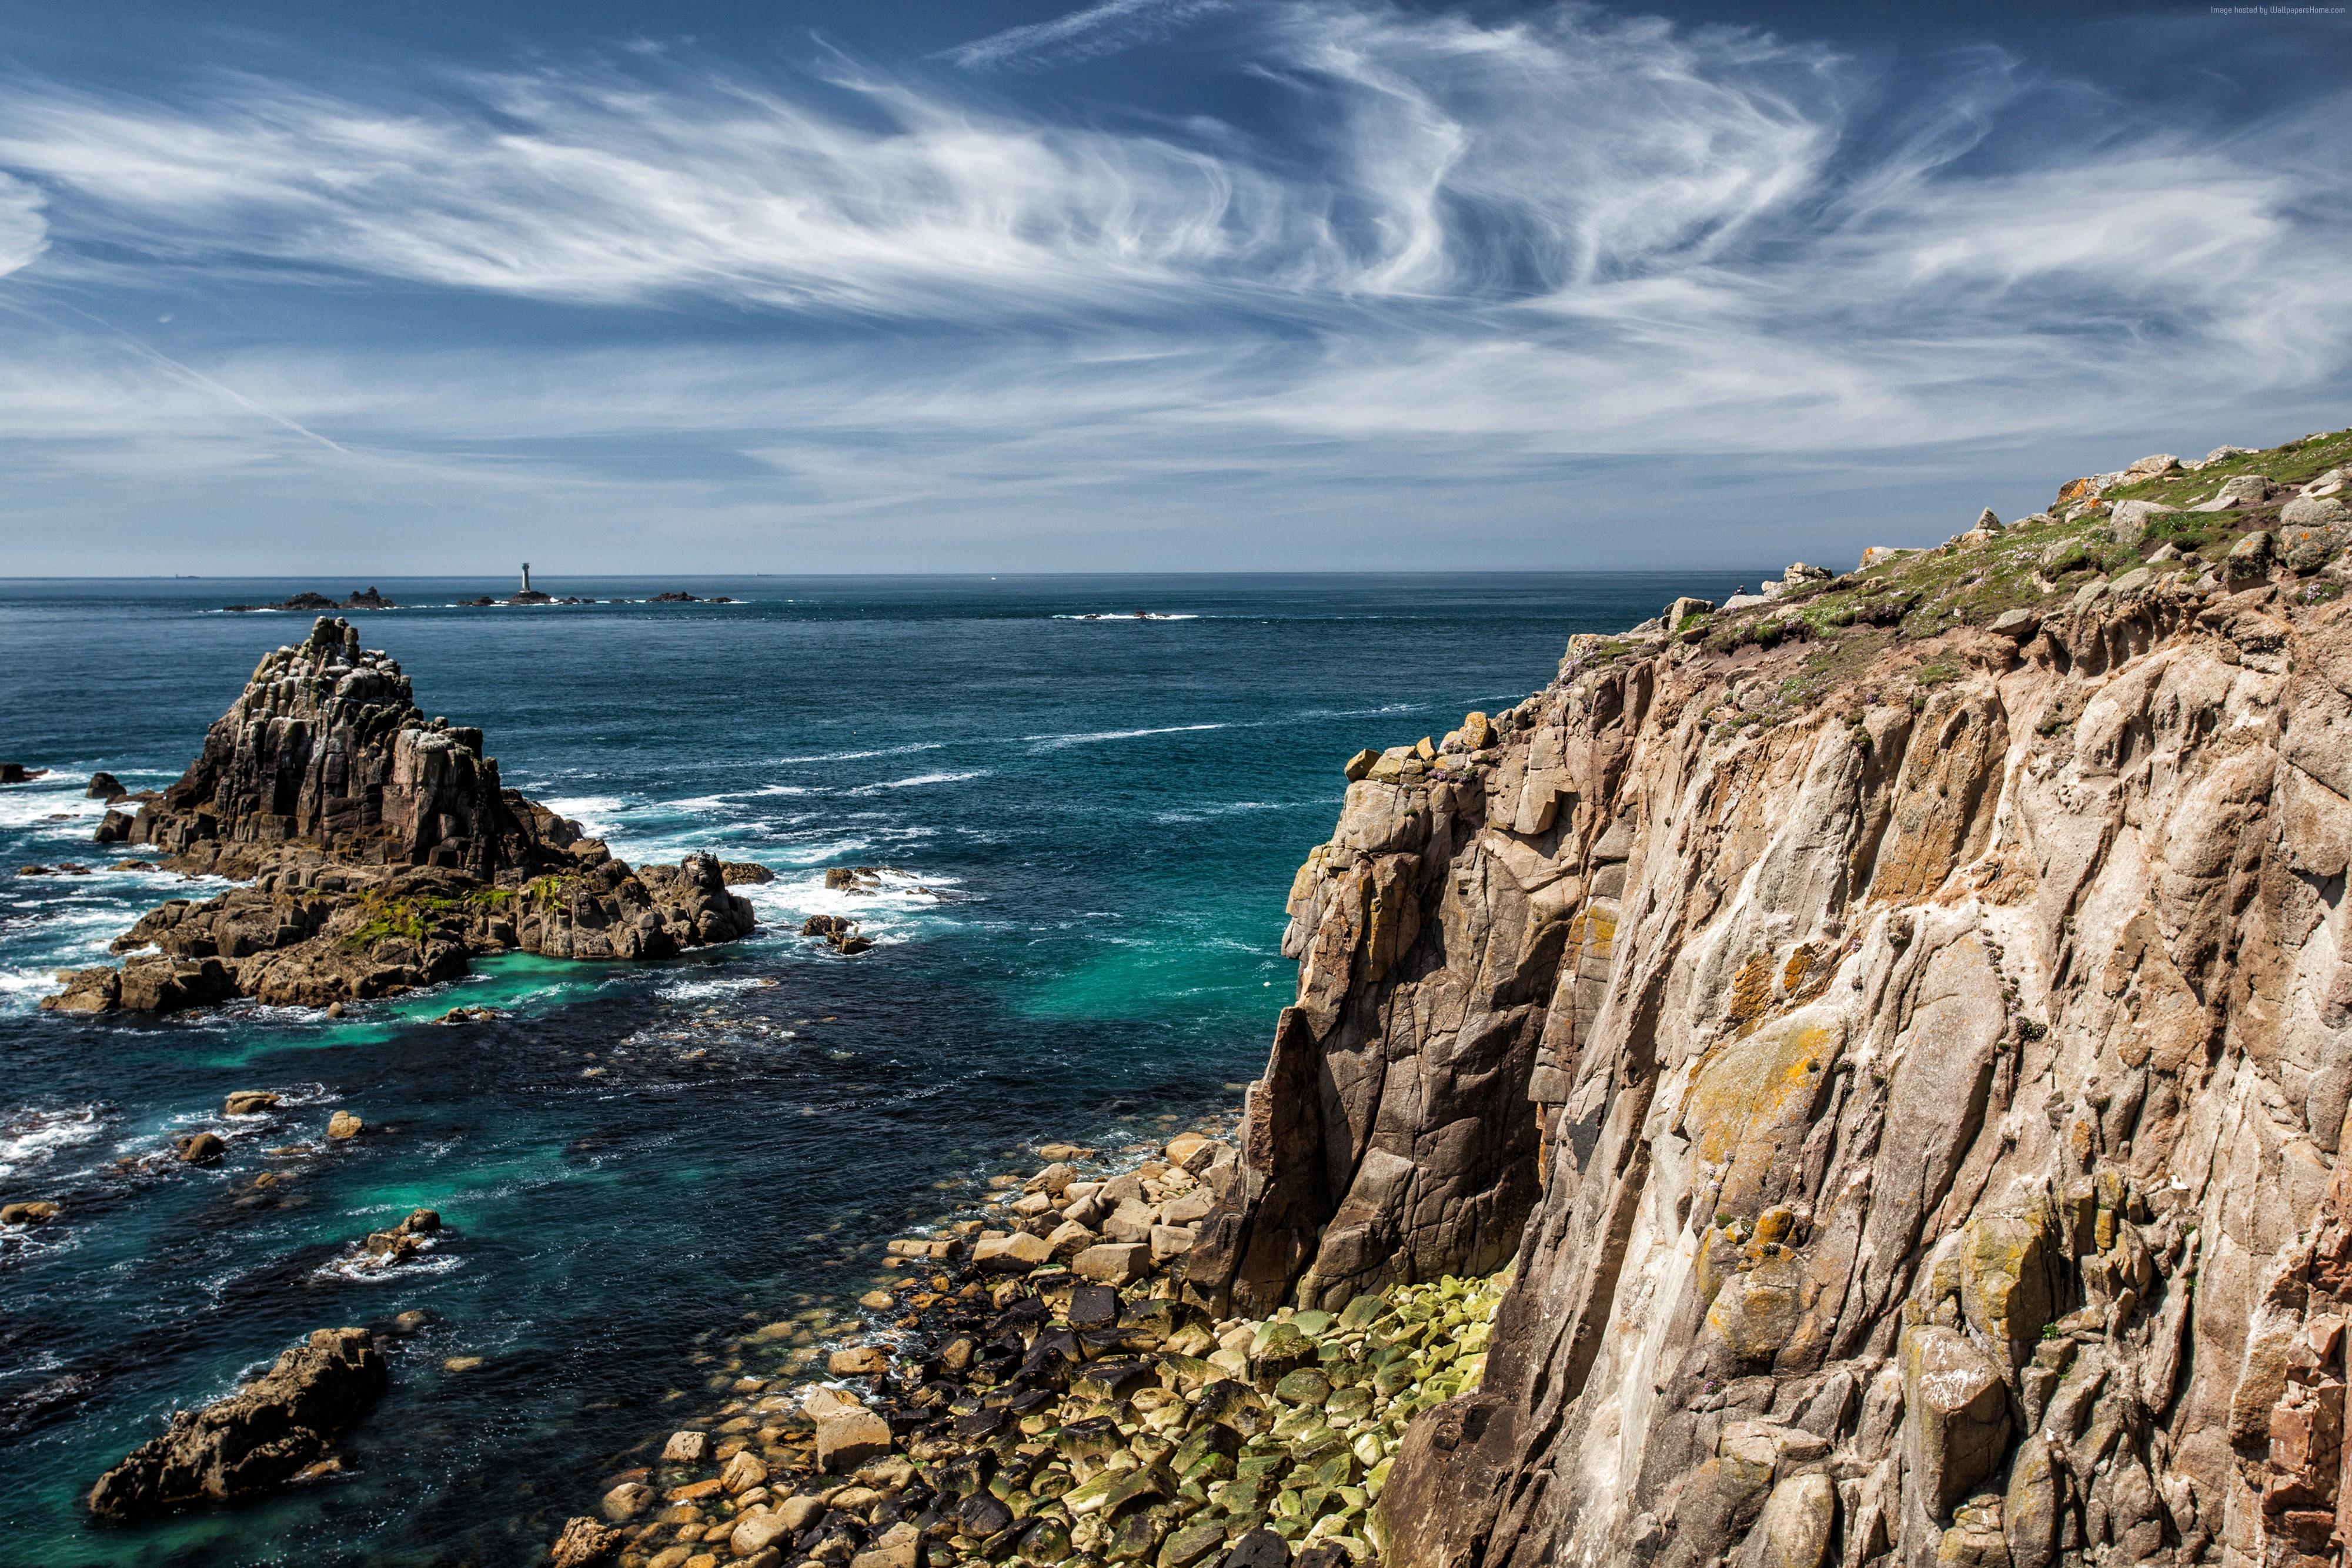 113091 Atlantic ocean sky rocks 4k wallpaper England 5k 4000x2667